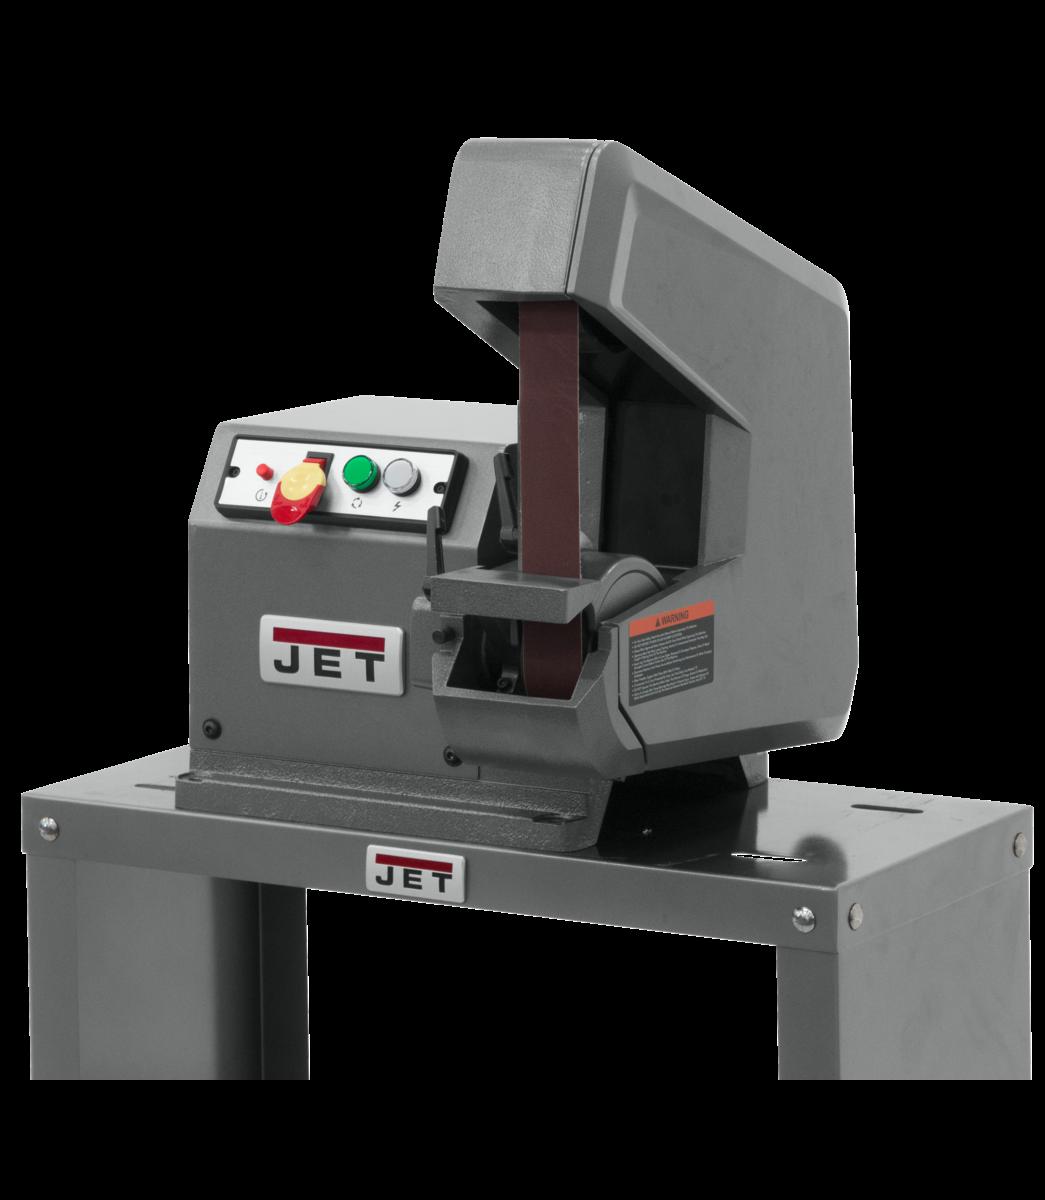 BGB-260-1 2X60 BELT GRINDER 115/230V,1PH